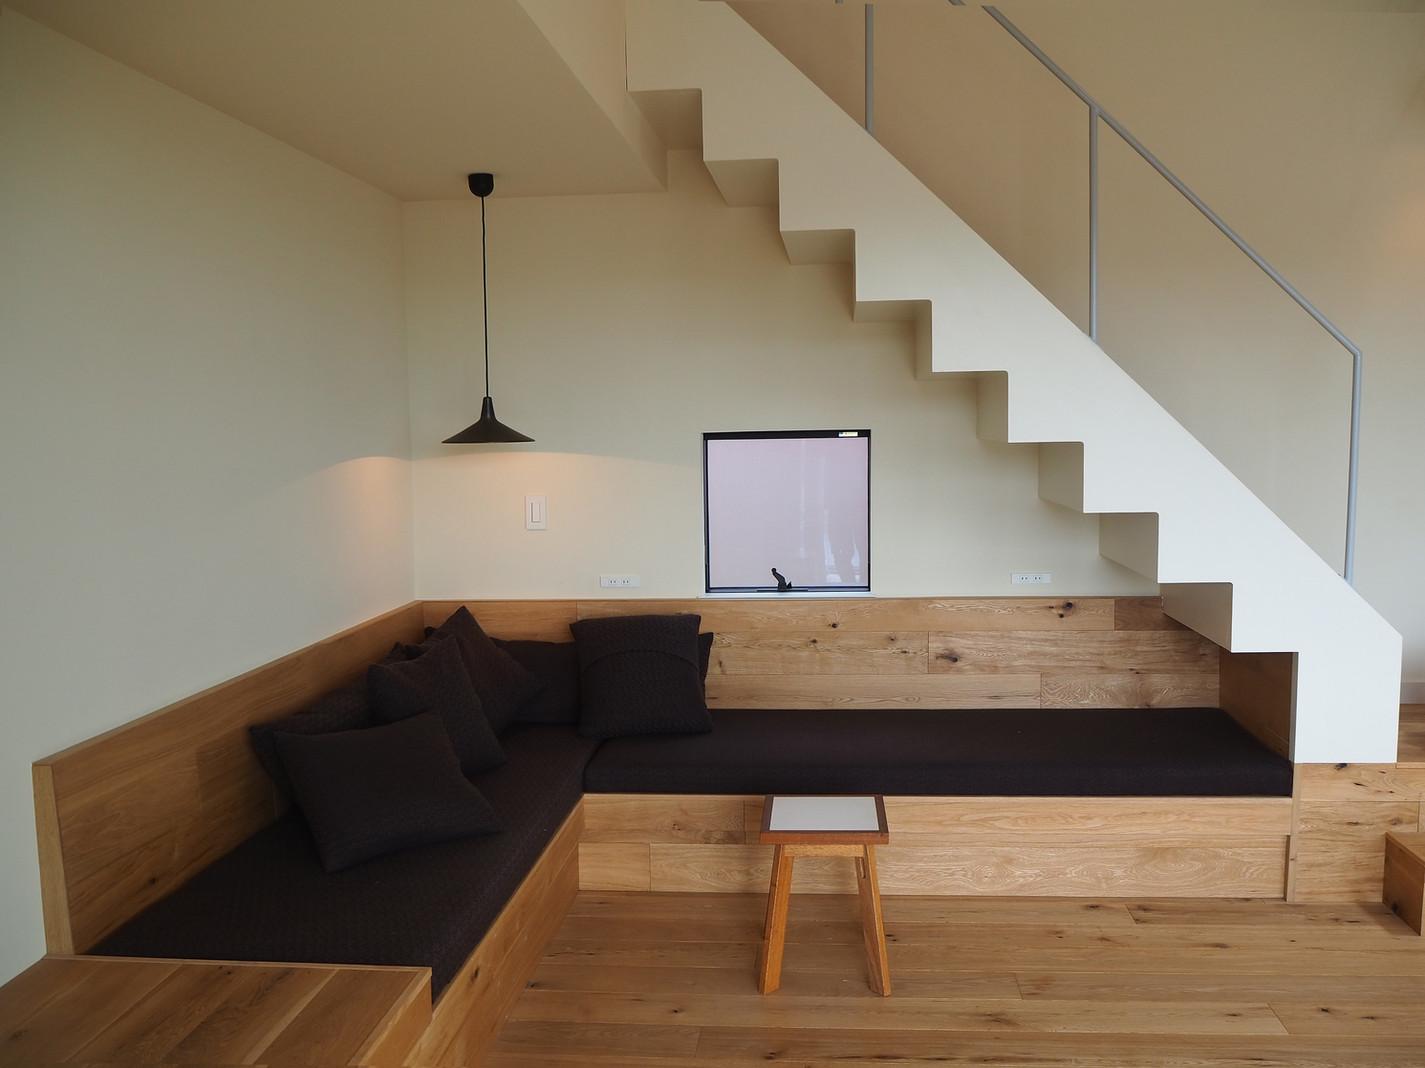 seino takashi design office & house 02_6